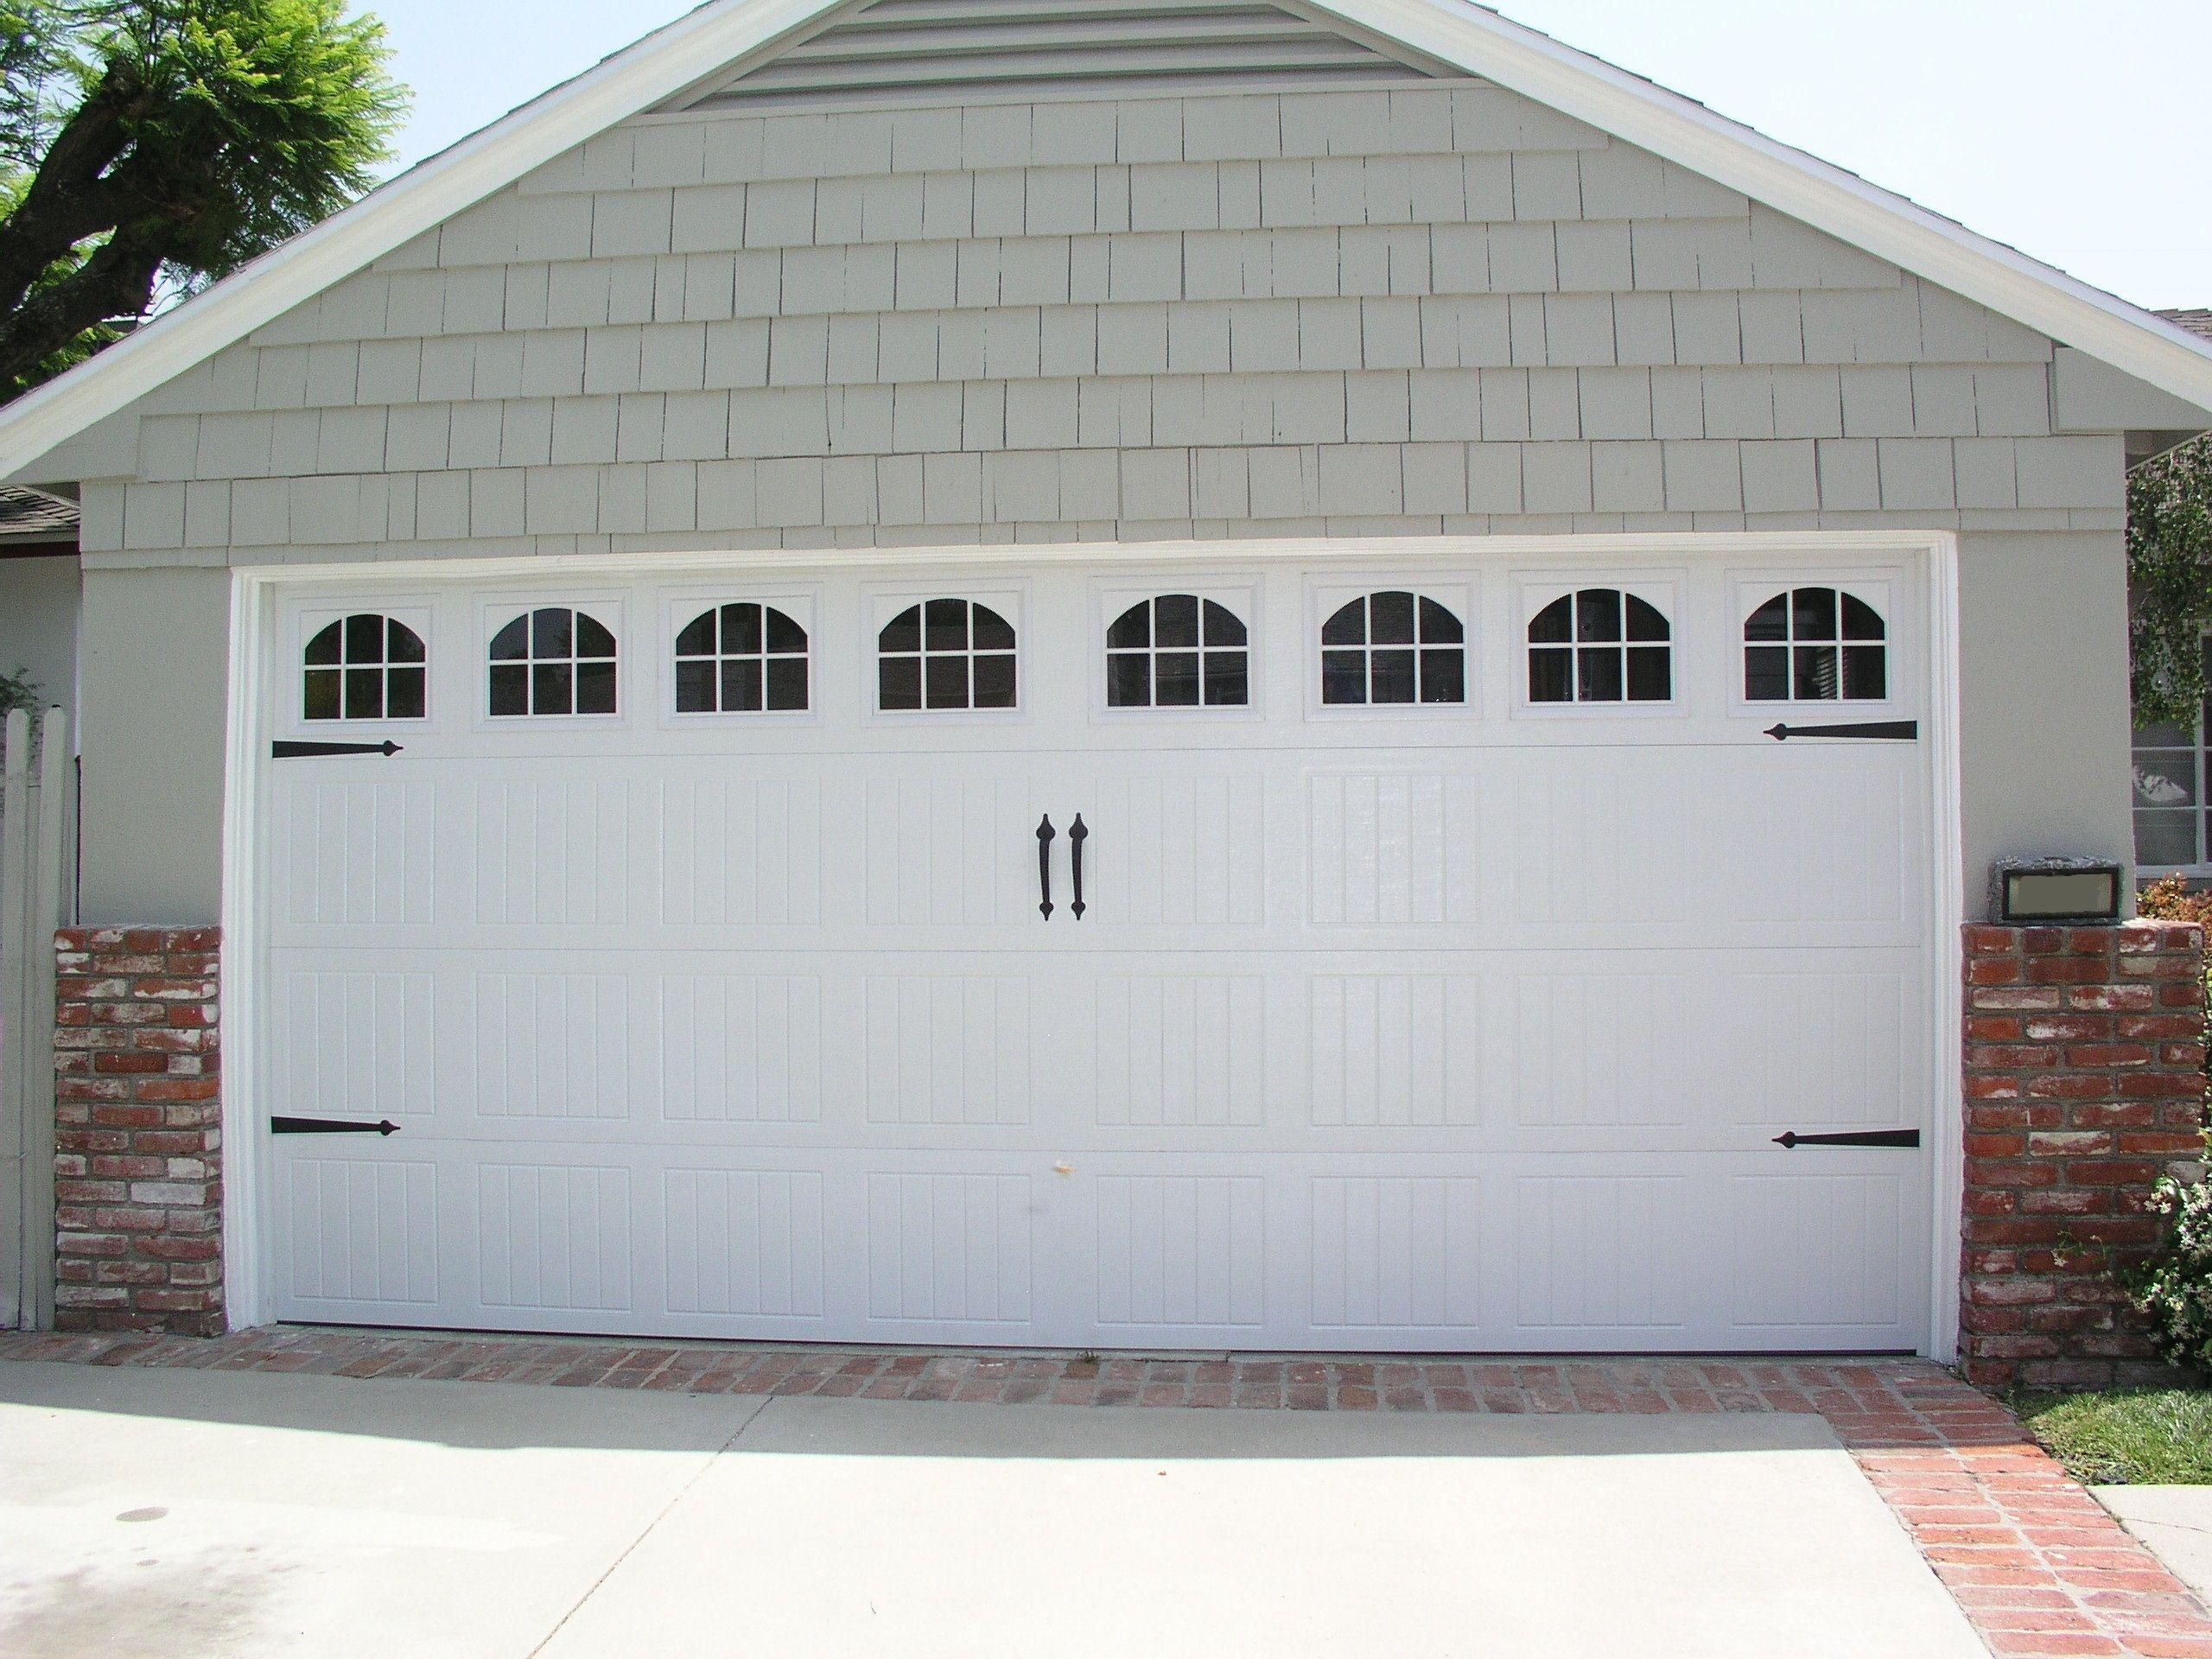 small resolution of wayne dalton sonoma white cascade with decorative hardware los angeles ca photo credit agi dyer garagedoor garagedoors garages garage door